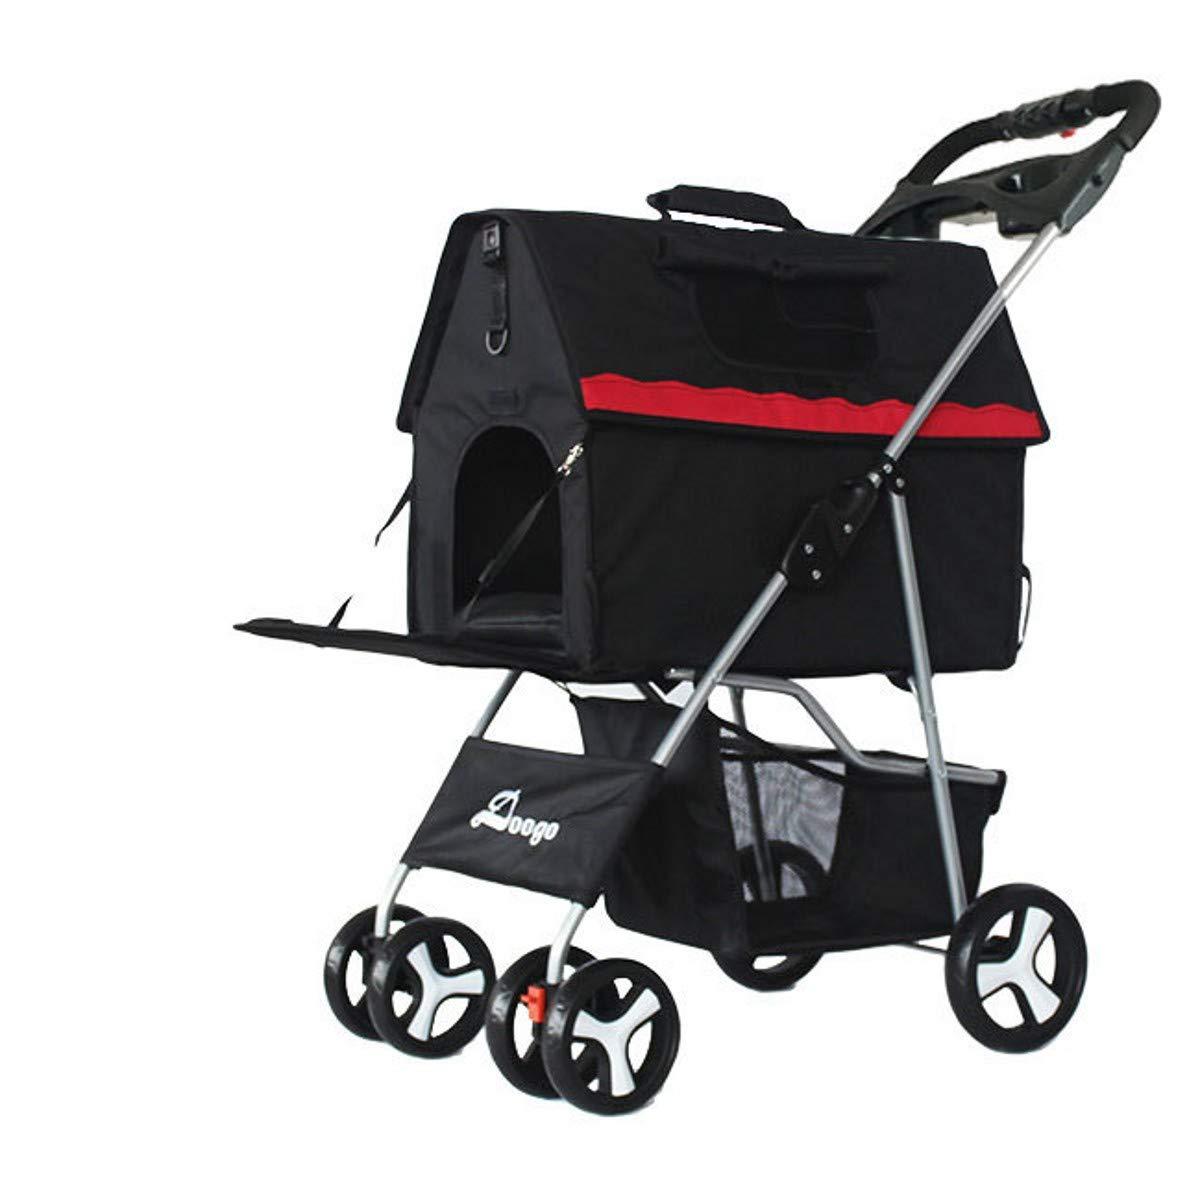 BLACK PLDDY Pet Trolley Cat Dog Carts Carrier Split Type Pet Pushchair Pet Stroller Dog Gram Multifunction For Small Dogs 10kg 4 Wheel (color   BLACK)